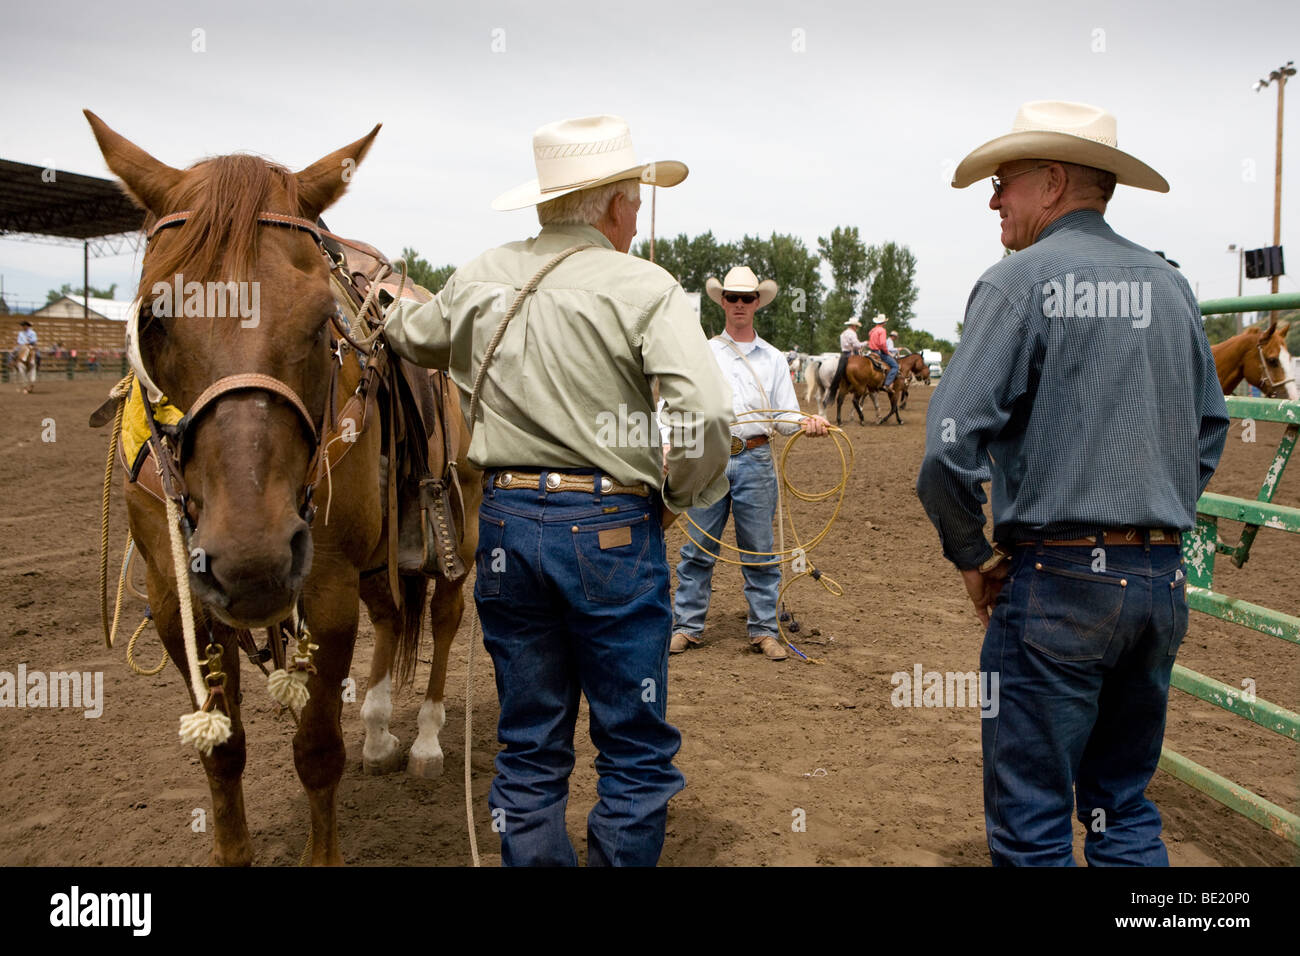 The Cowboys Stockfotos & The Cowboys Bilder - Alamy